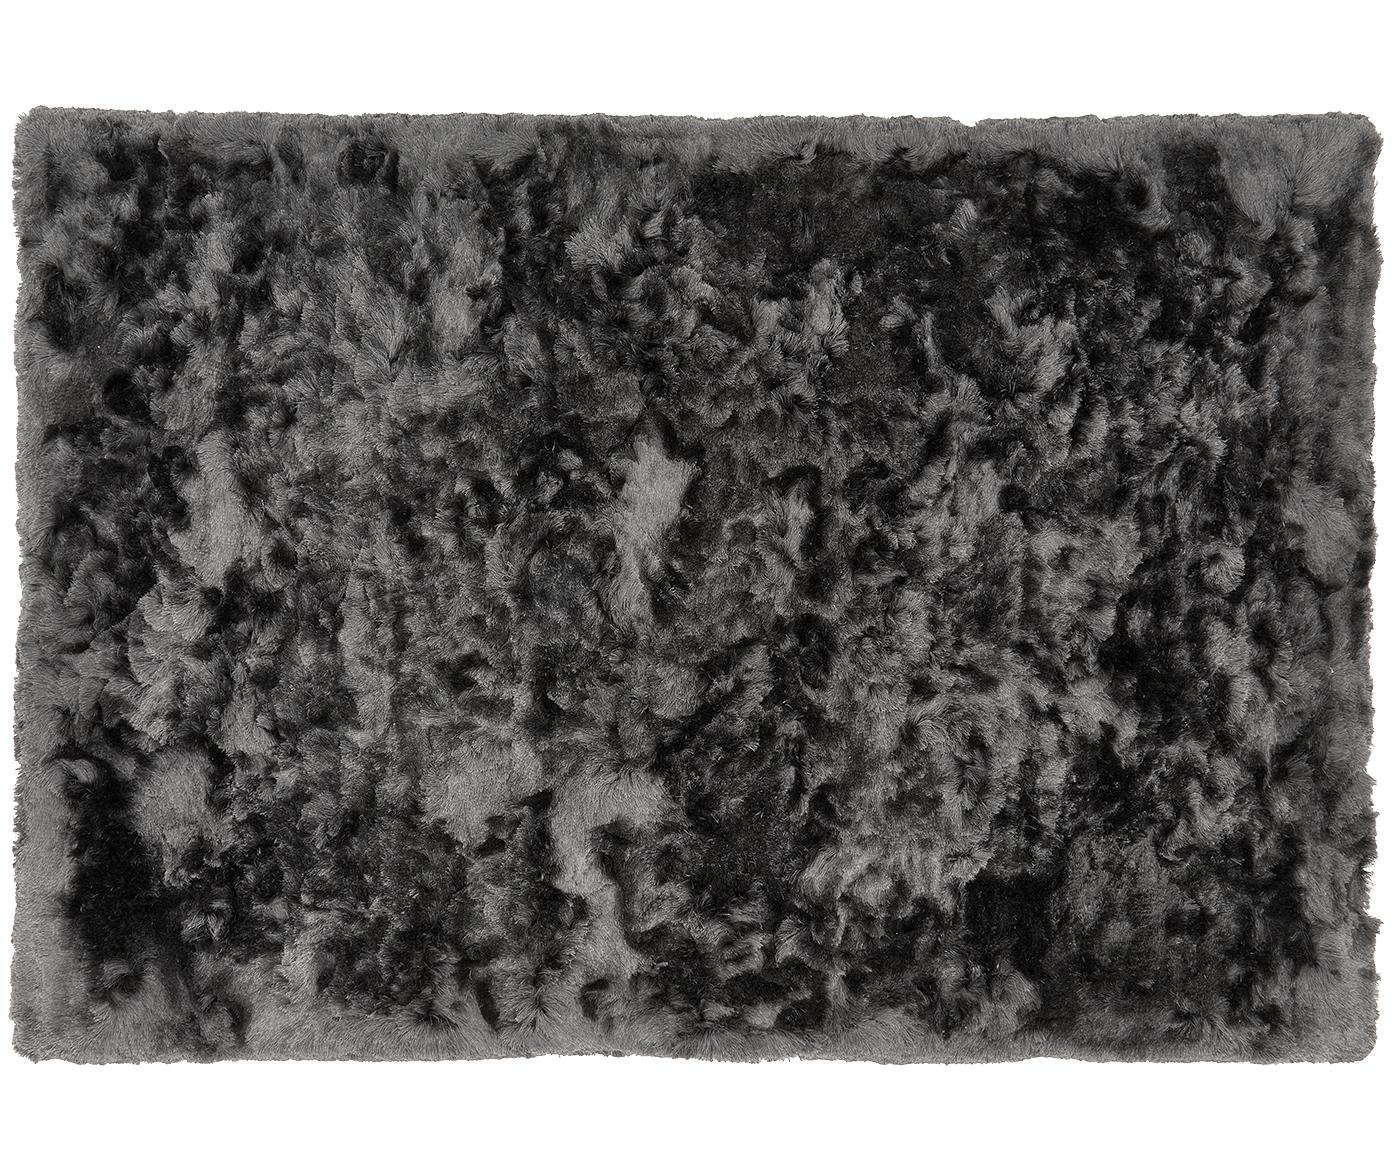 Alfombra artesanal de pelo largo brillante Jimmy, Parte superior: 100%poliéster, Reverso: 100%algodón, Gris oscuro, An 120 x L 180 cm (Tamaño S)